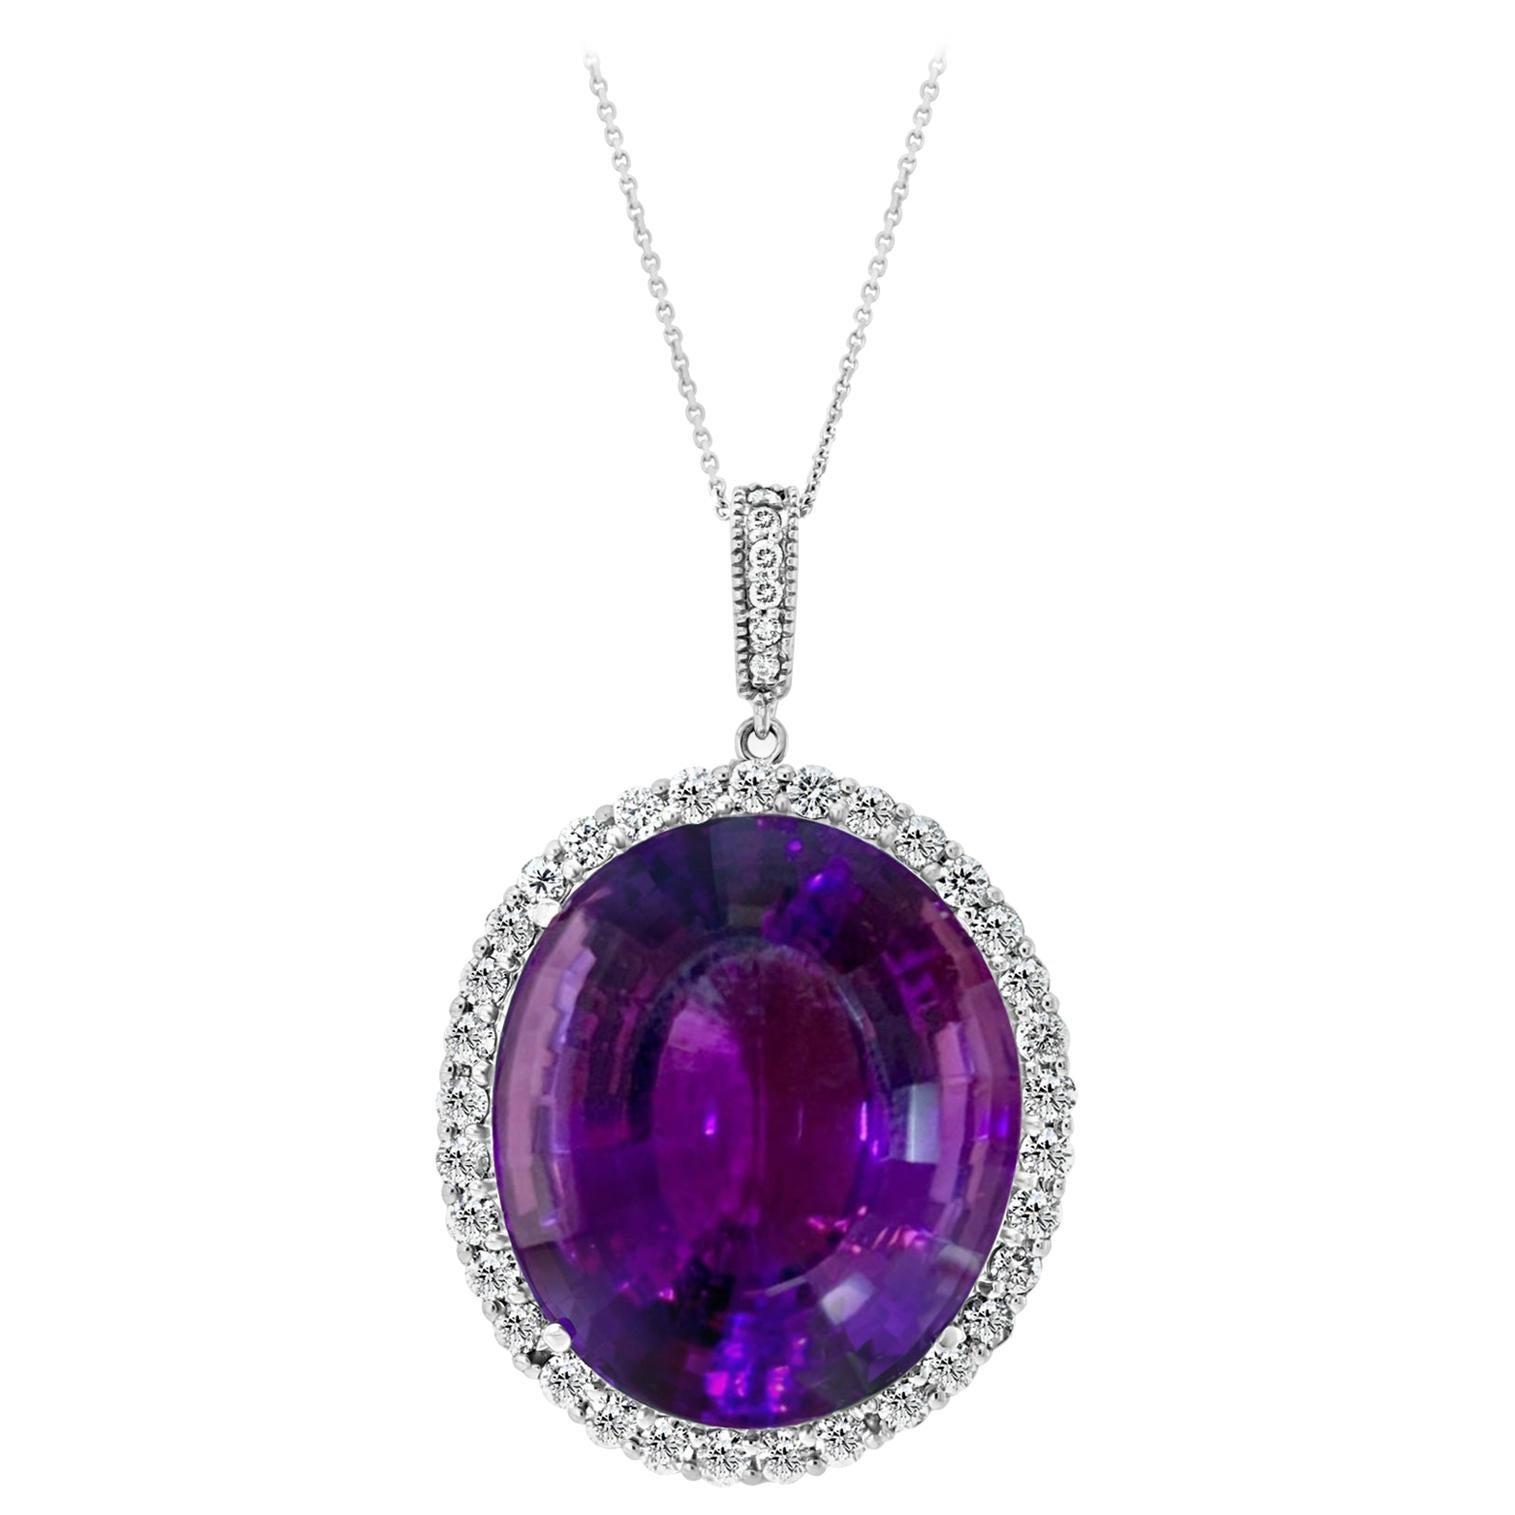 55 Carat Amethyst & 2 Carat Diamond Pendant Necklace 14 Karat White Gold + Chain